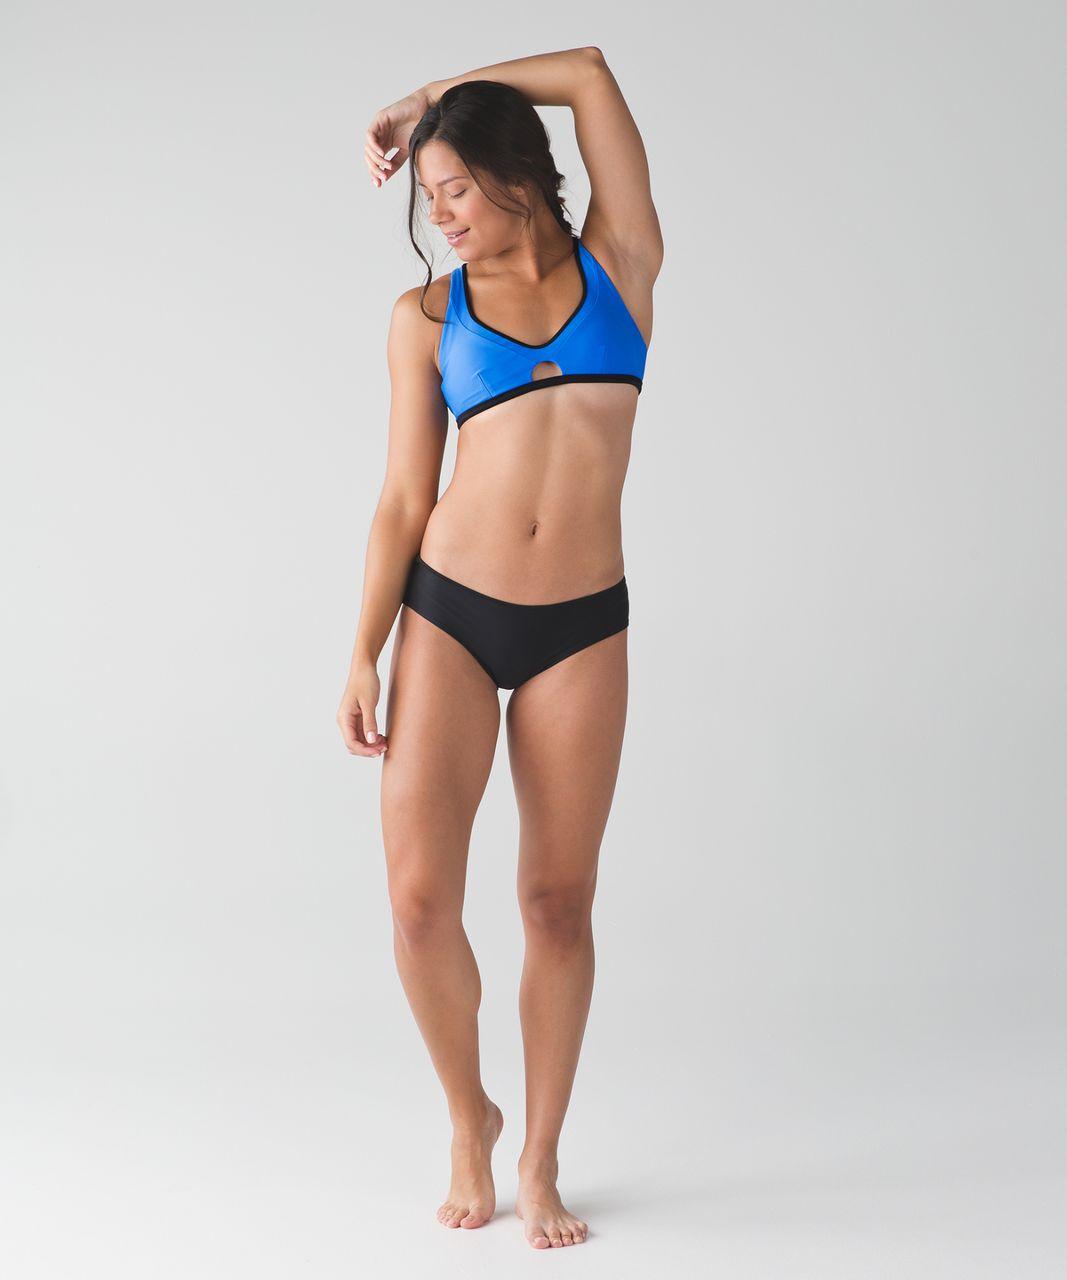 Lululemon Surf To Sand Sport Top II - Pipe Dream Blue / Black